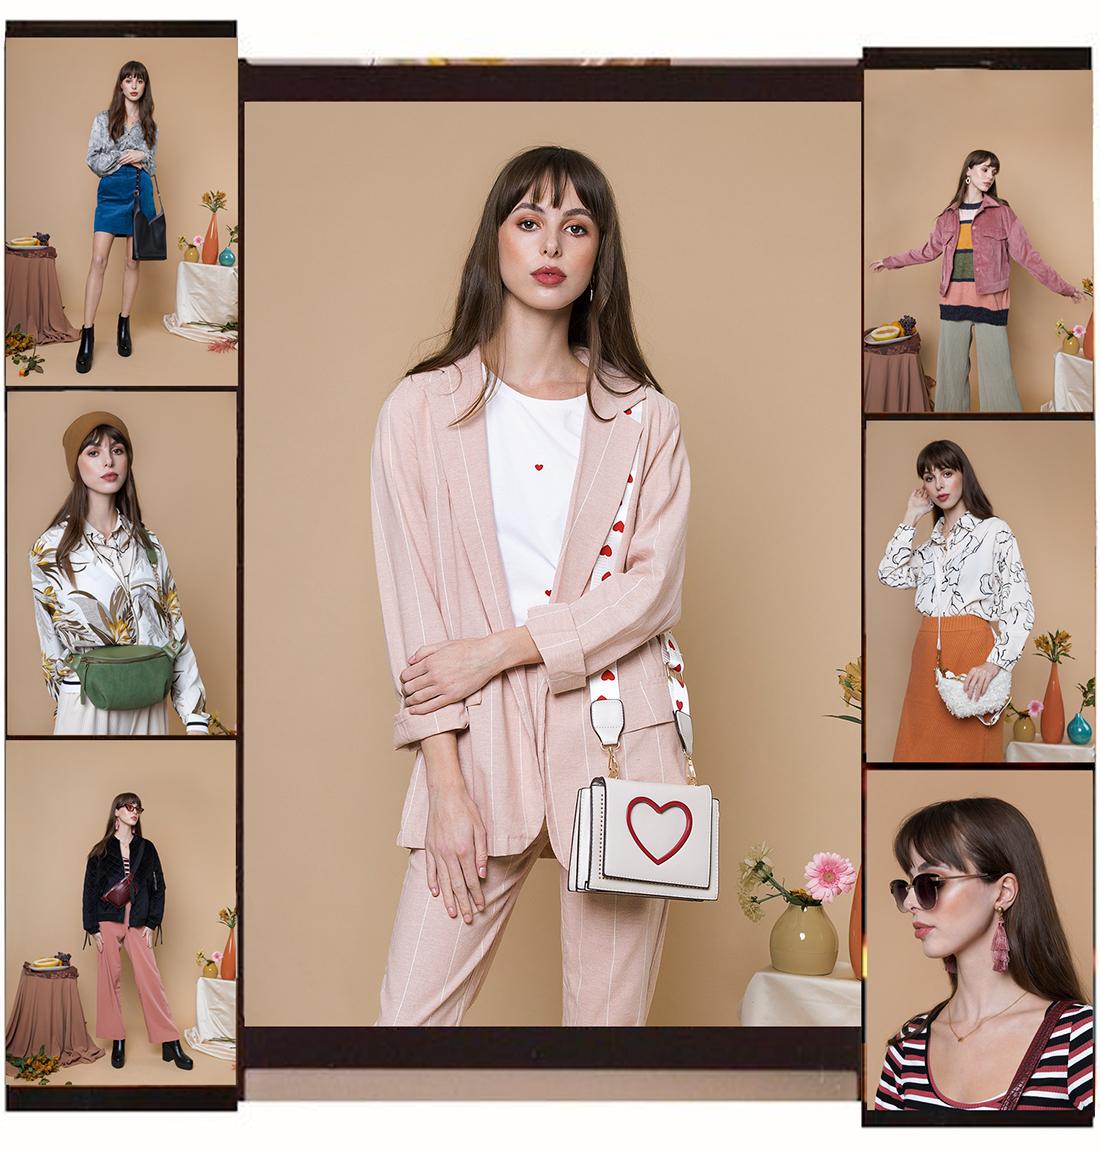 Sugar + Style studio e-commerce fashion shoot by London photographer Ailera Stone